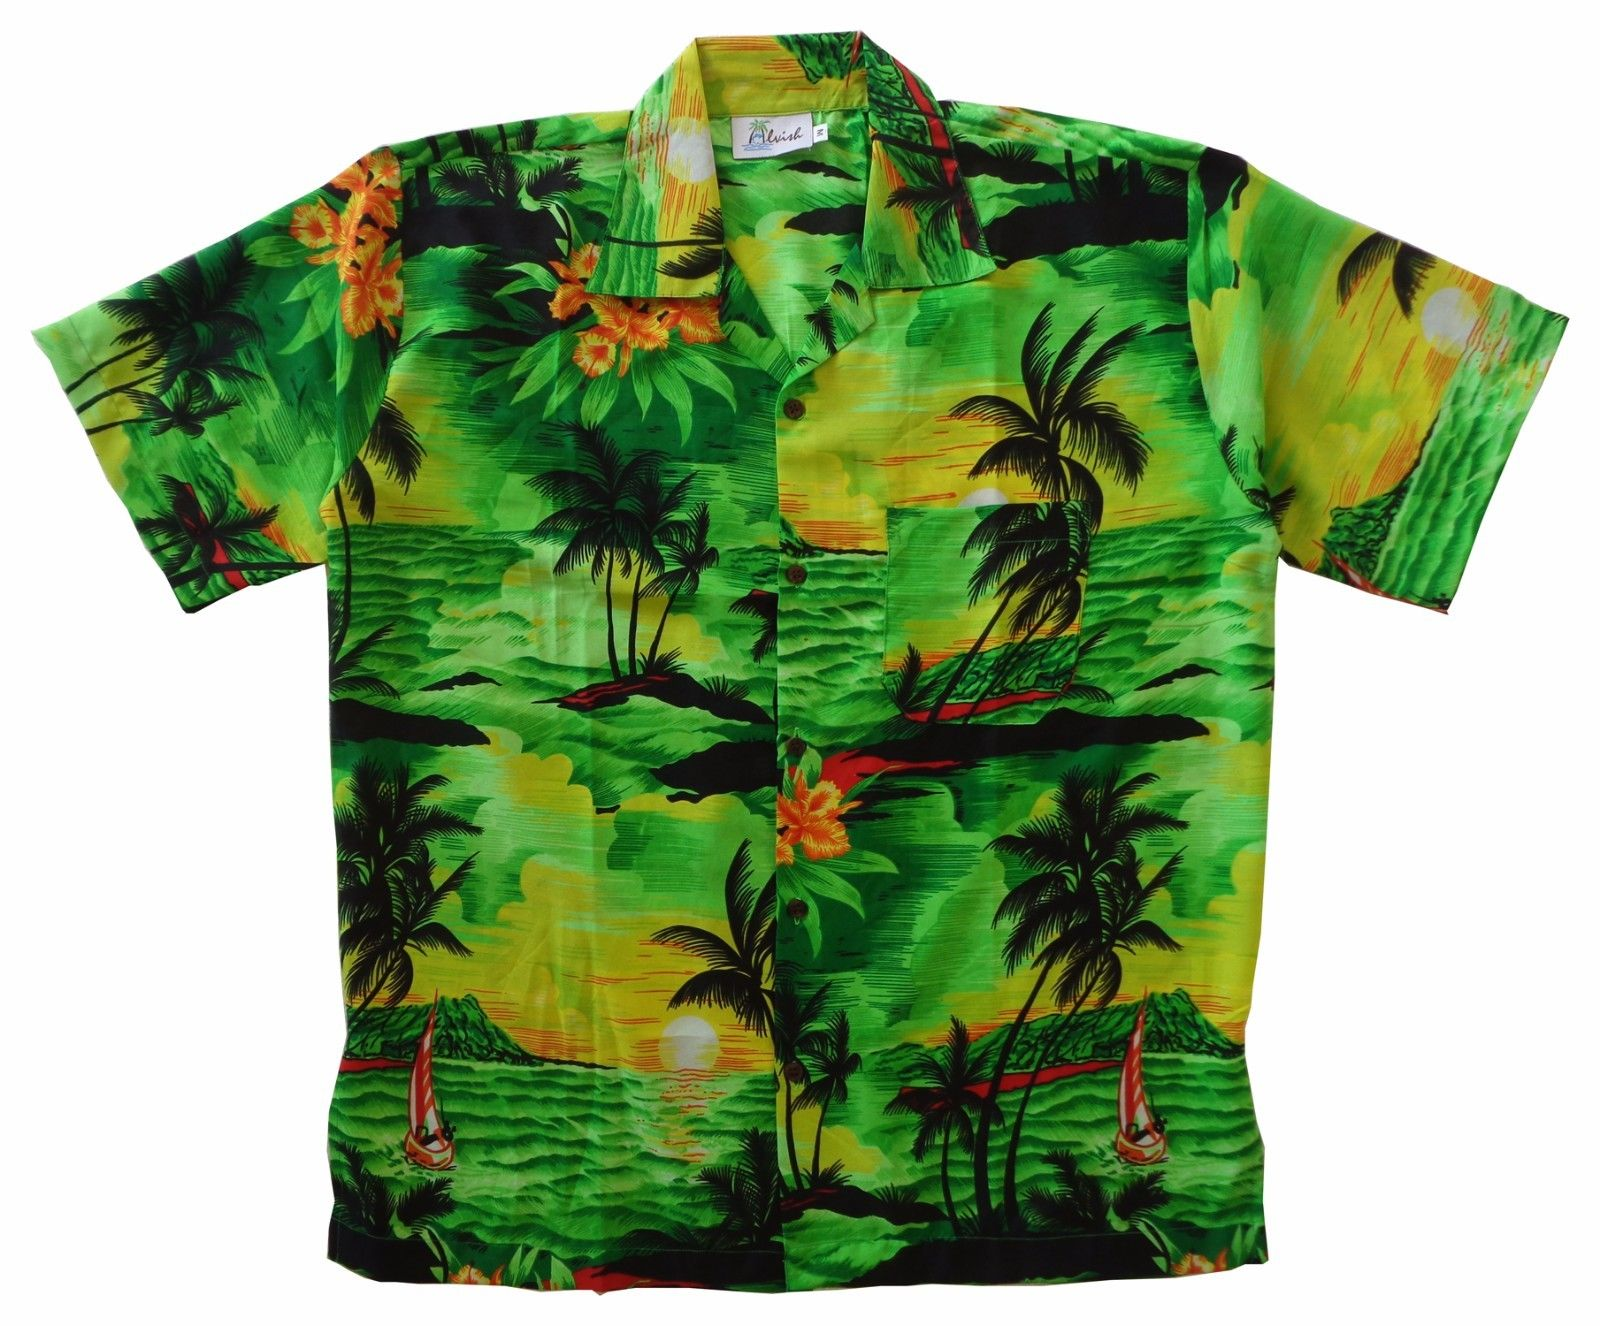 Hawaiian-Shirt-Mens-Allover-Print-Beach-Camp-Party-Aloha-Beach-Holiday-Camp thumbnail 11